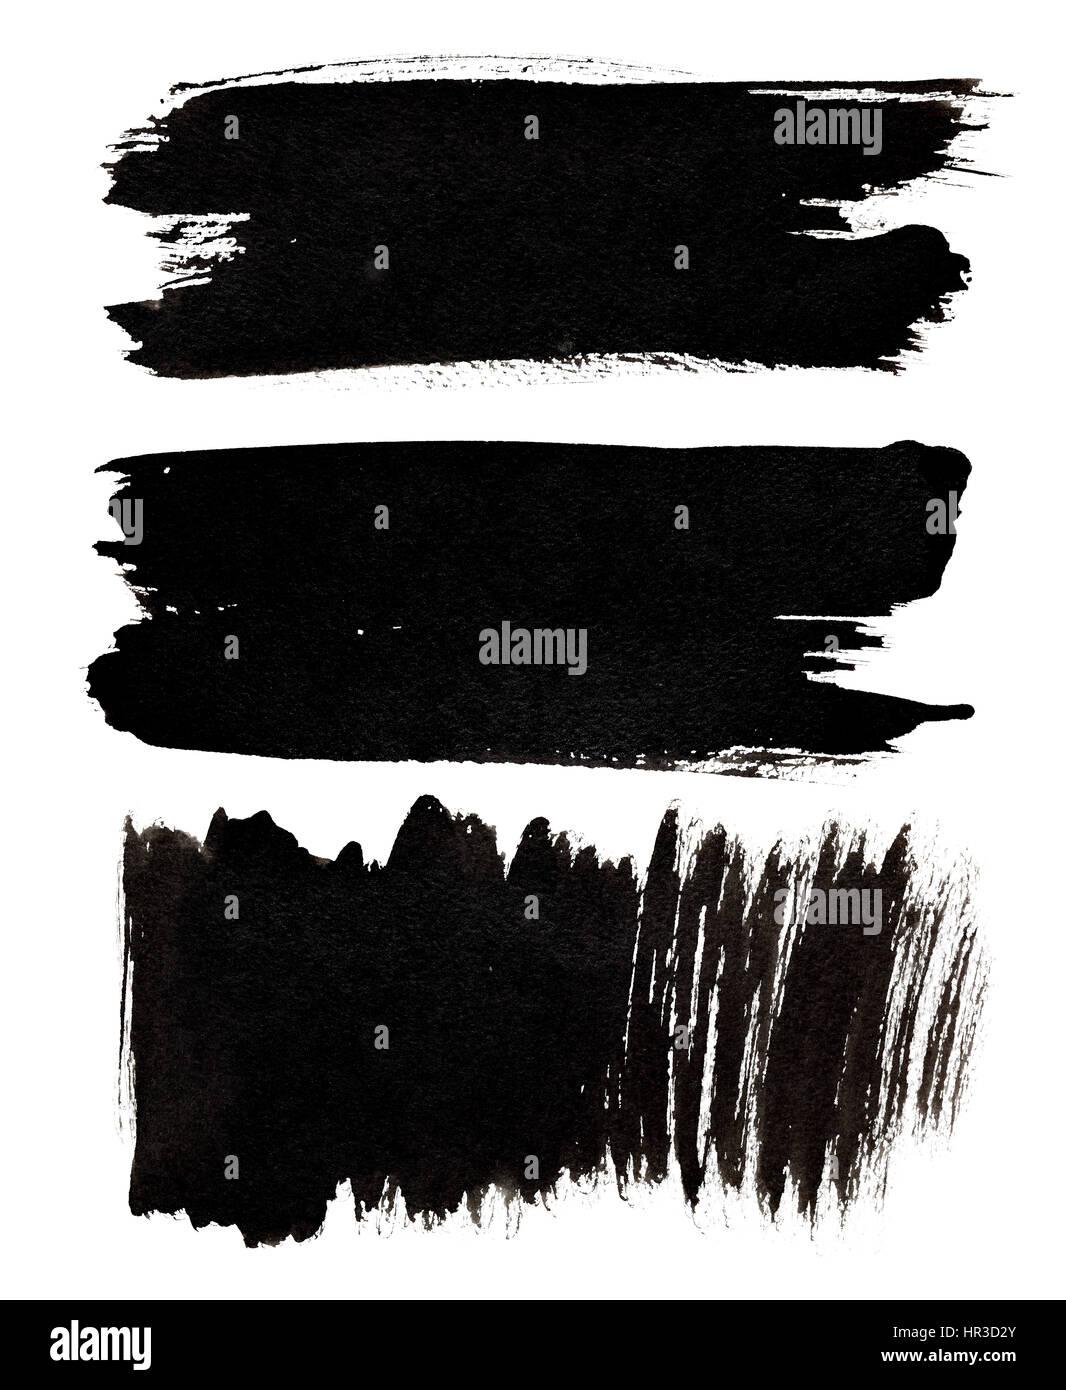 Set of black brush strokes isolated over the white background - Stock Image